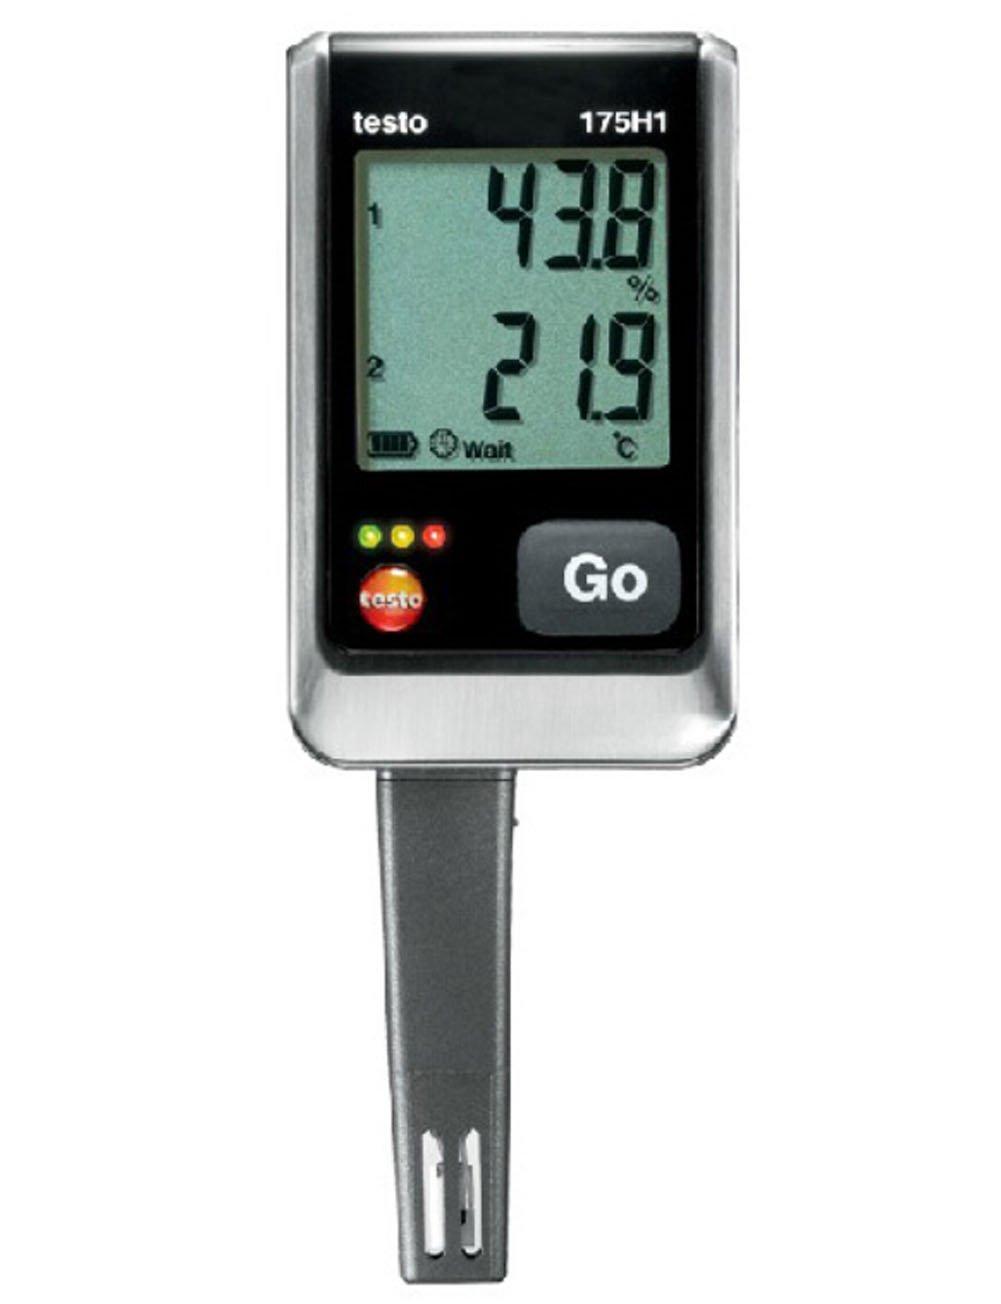 SSEYL Testo 175 H1 - Temperature and humidity data logger Testo 175-H1